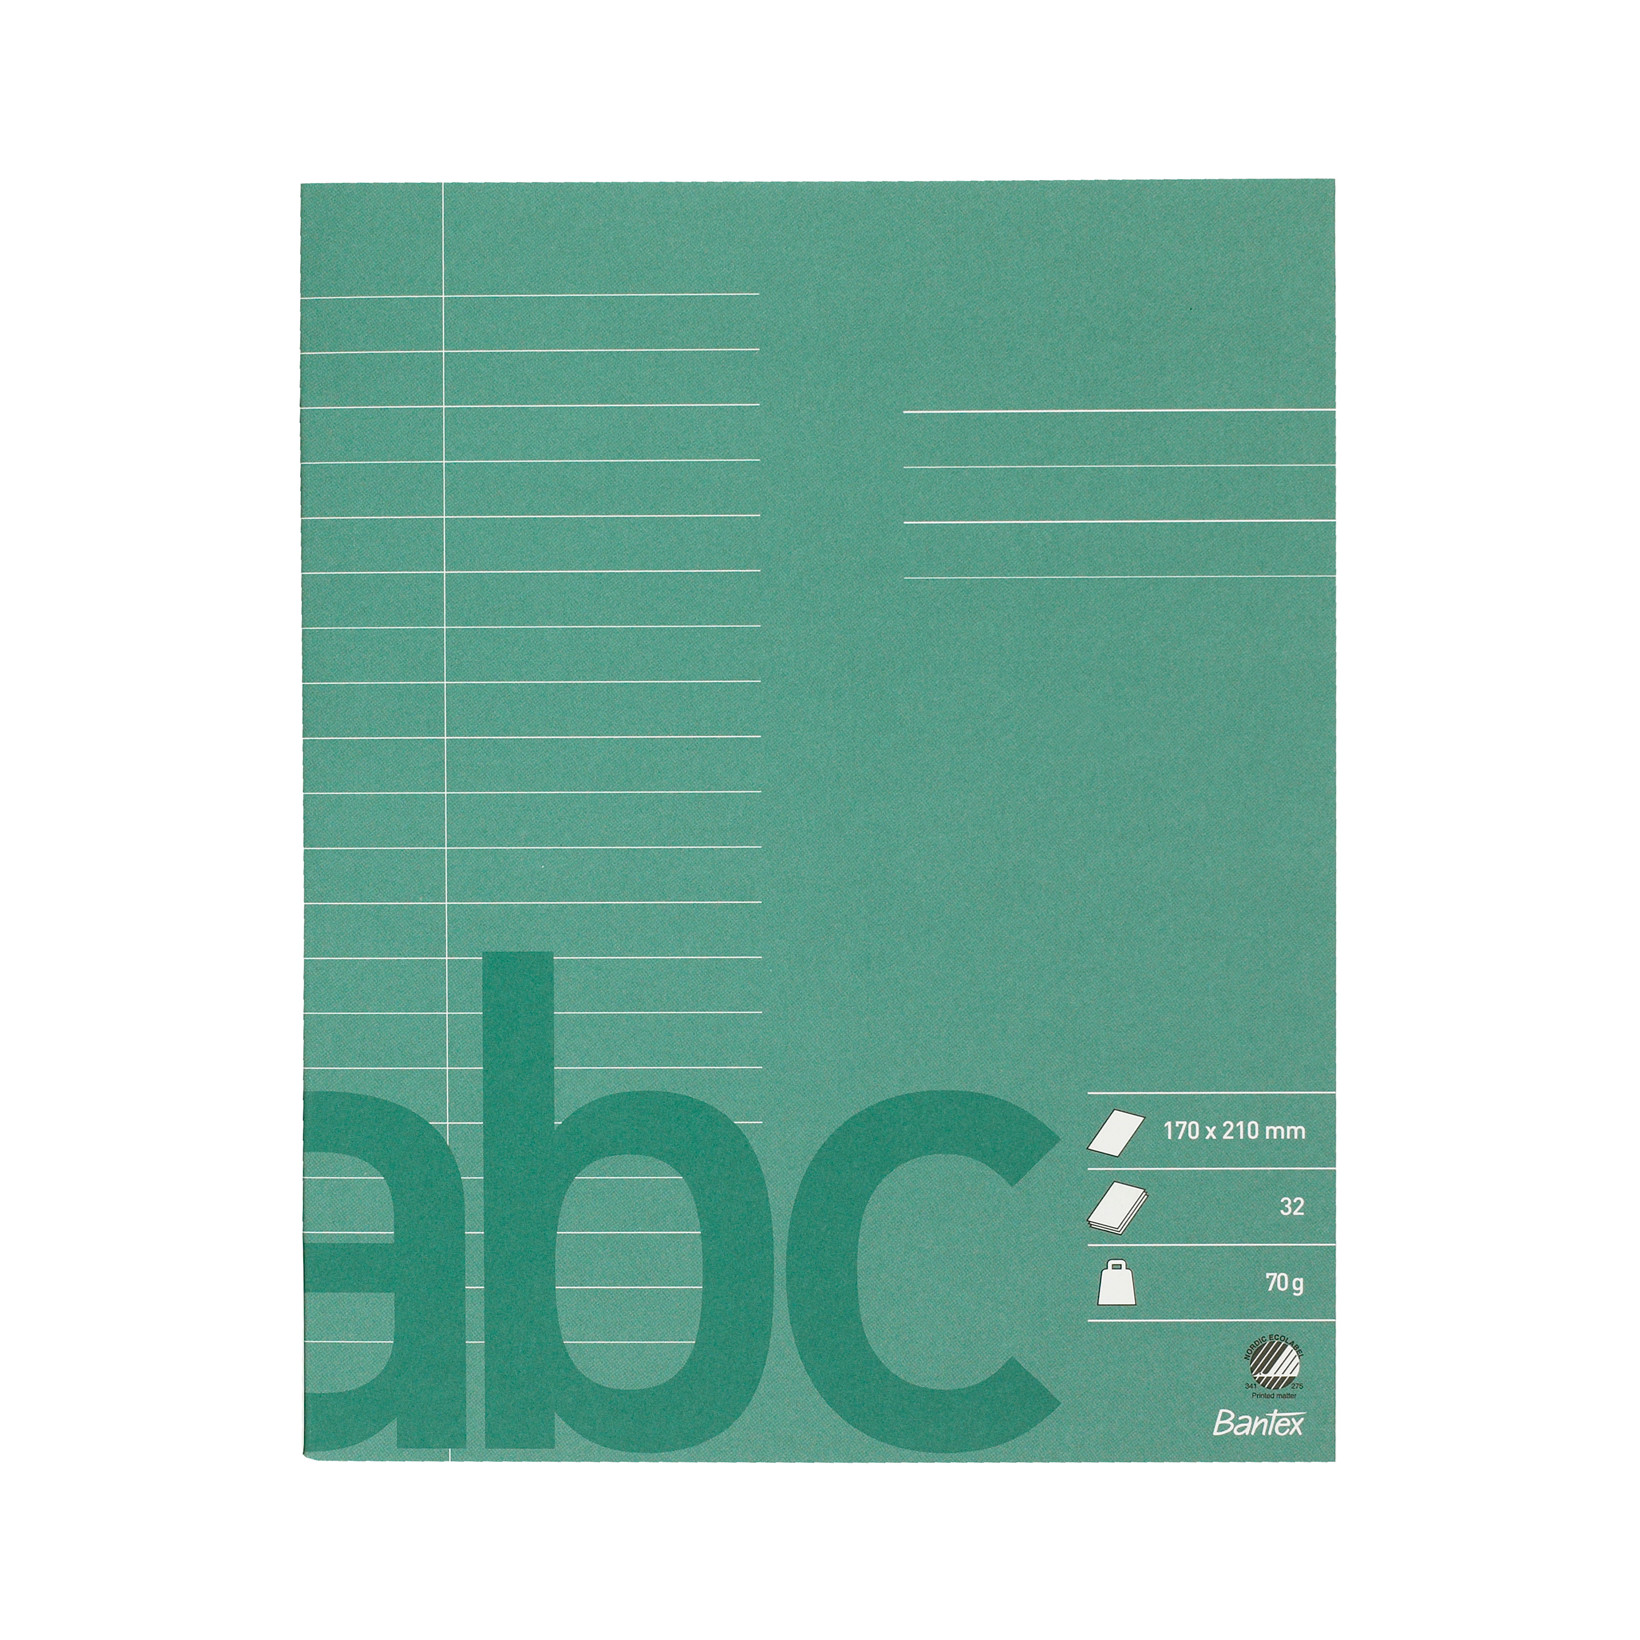 Bantex Skolehæfte 17 x 21 cm - Mørk grøn med 20 linjer 9 mm - 32 sider